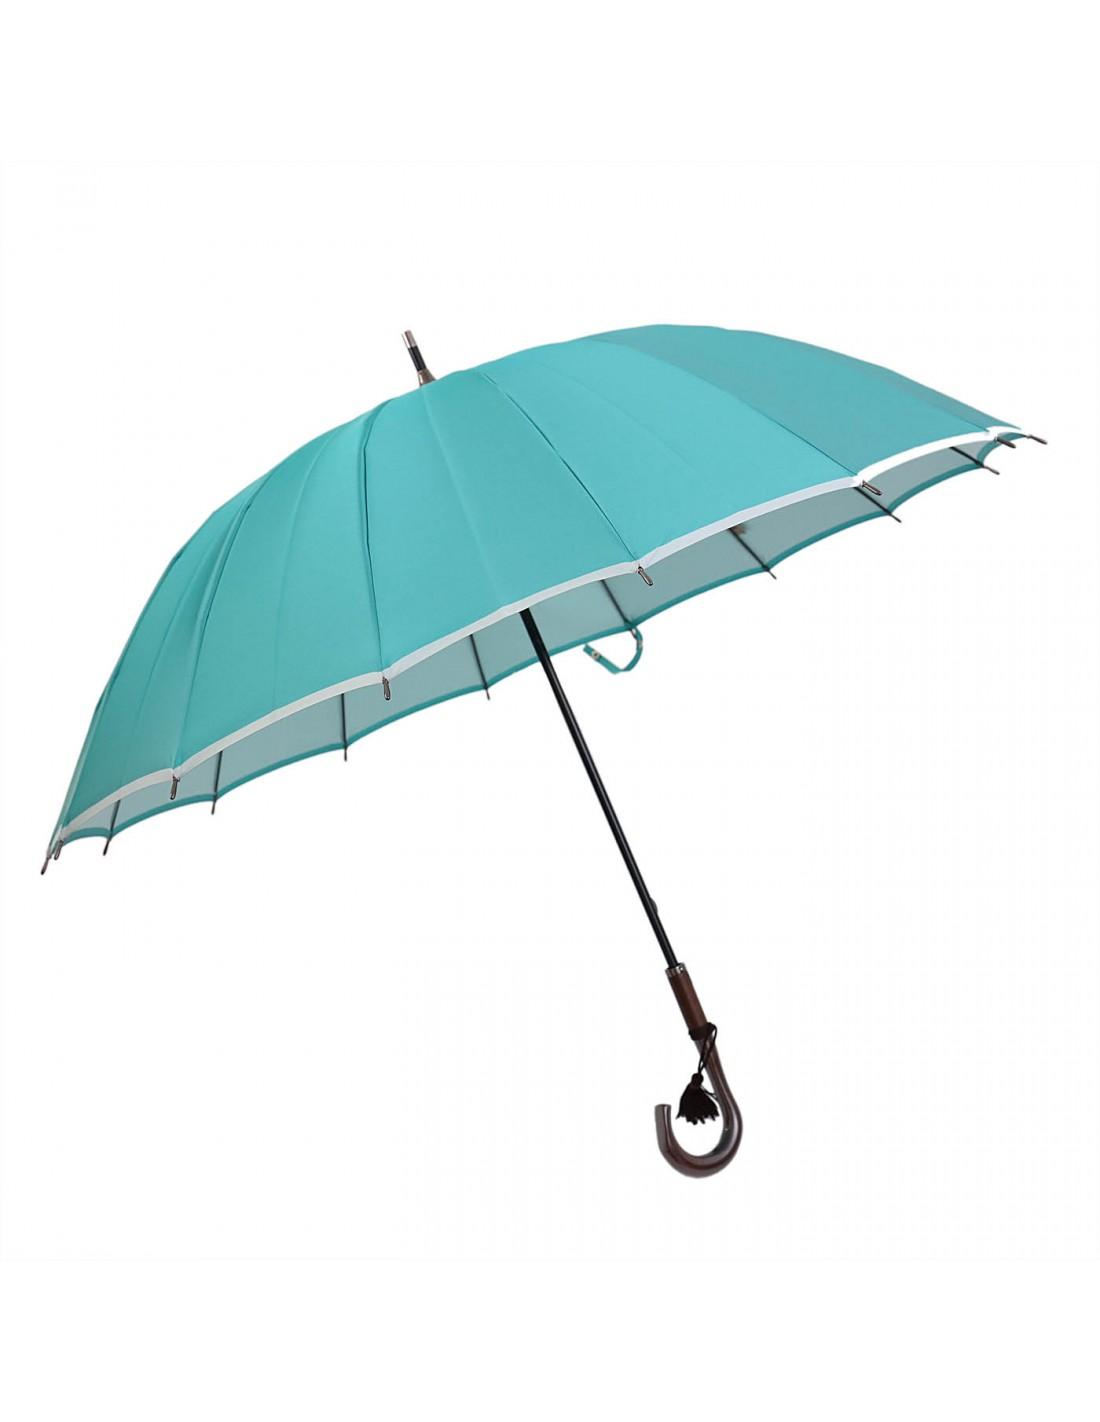 Damen Regenschirm Mint/Weiß